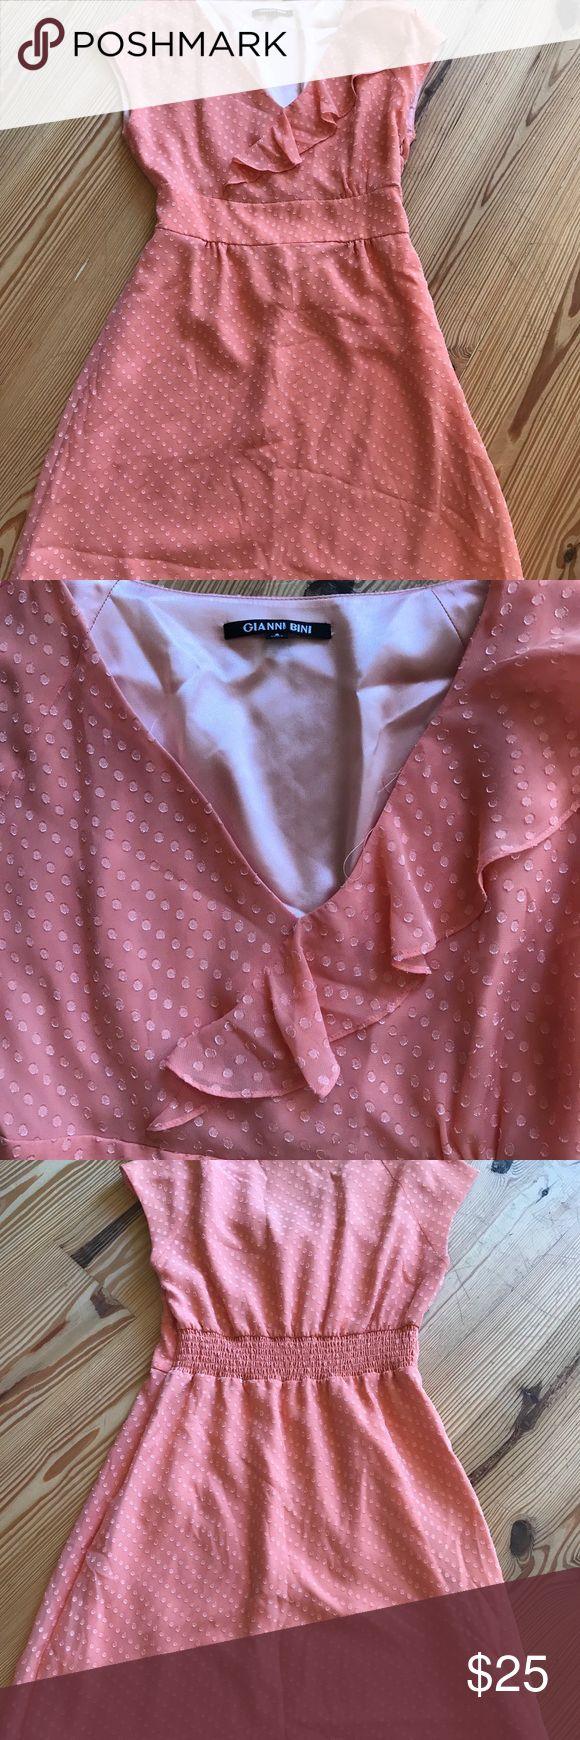 EUC Gianni Bini peach dress with Ruffle. Size 8 EUC Gianni Bini peach dress with Ruffle. Size 8 V neck around knee length Gianni Bini Dresses Midi